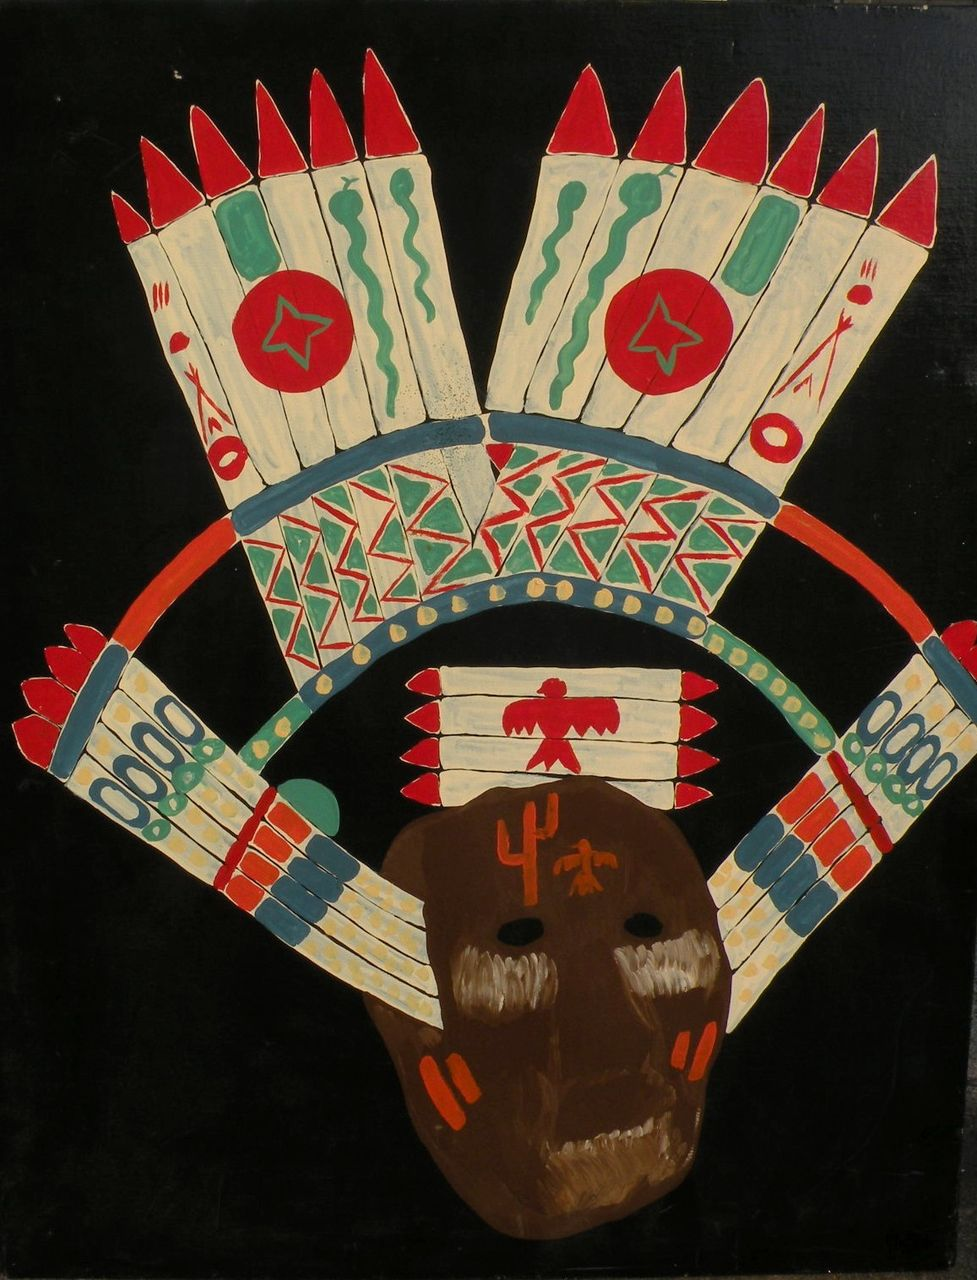 Southwestern Native American ethnographic art original painting of ceremonial headgear